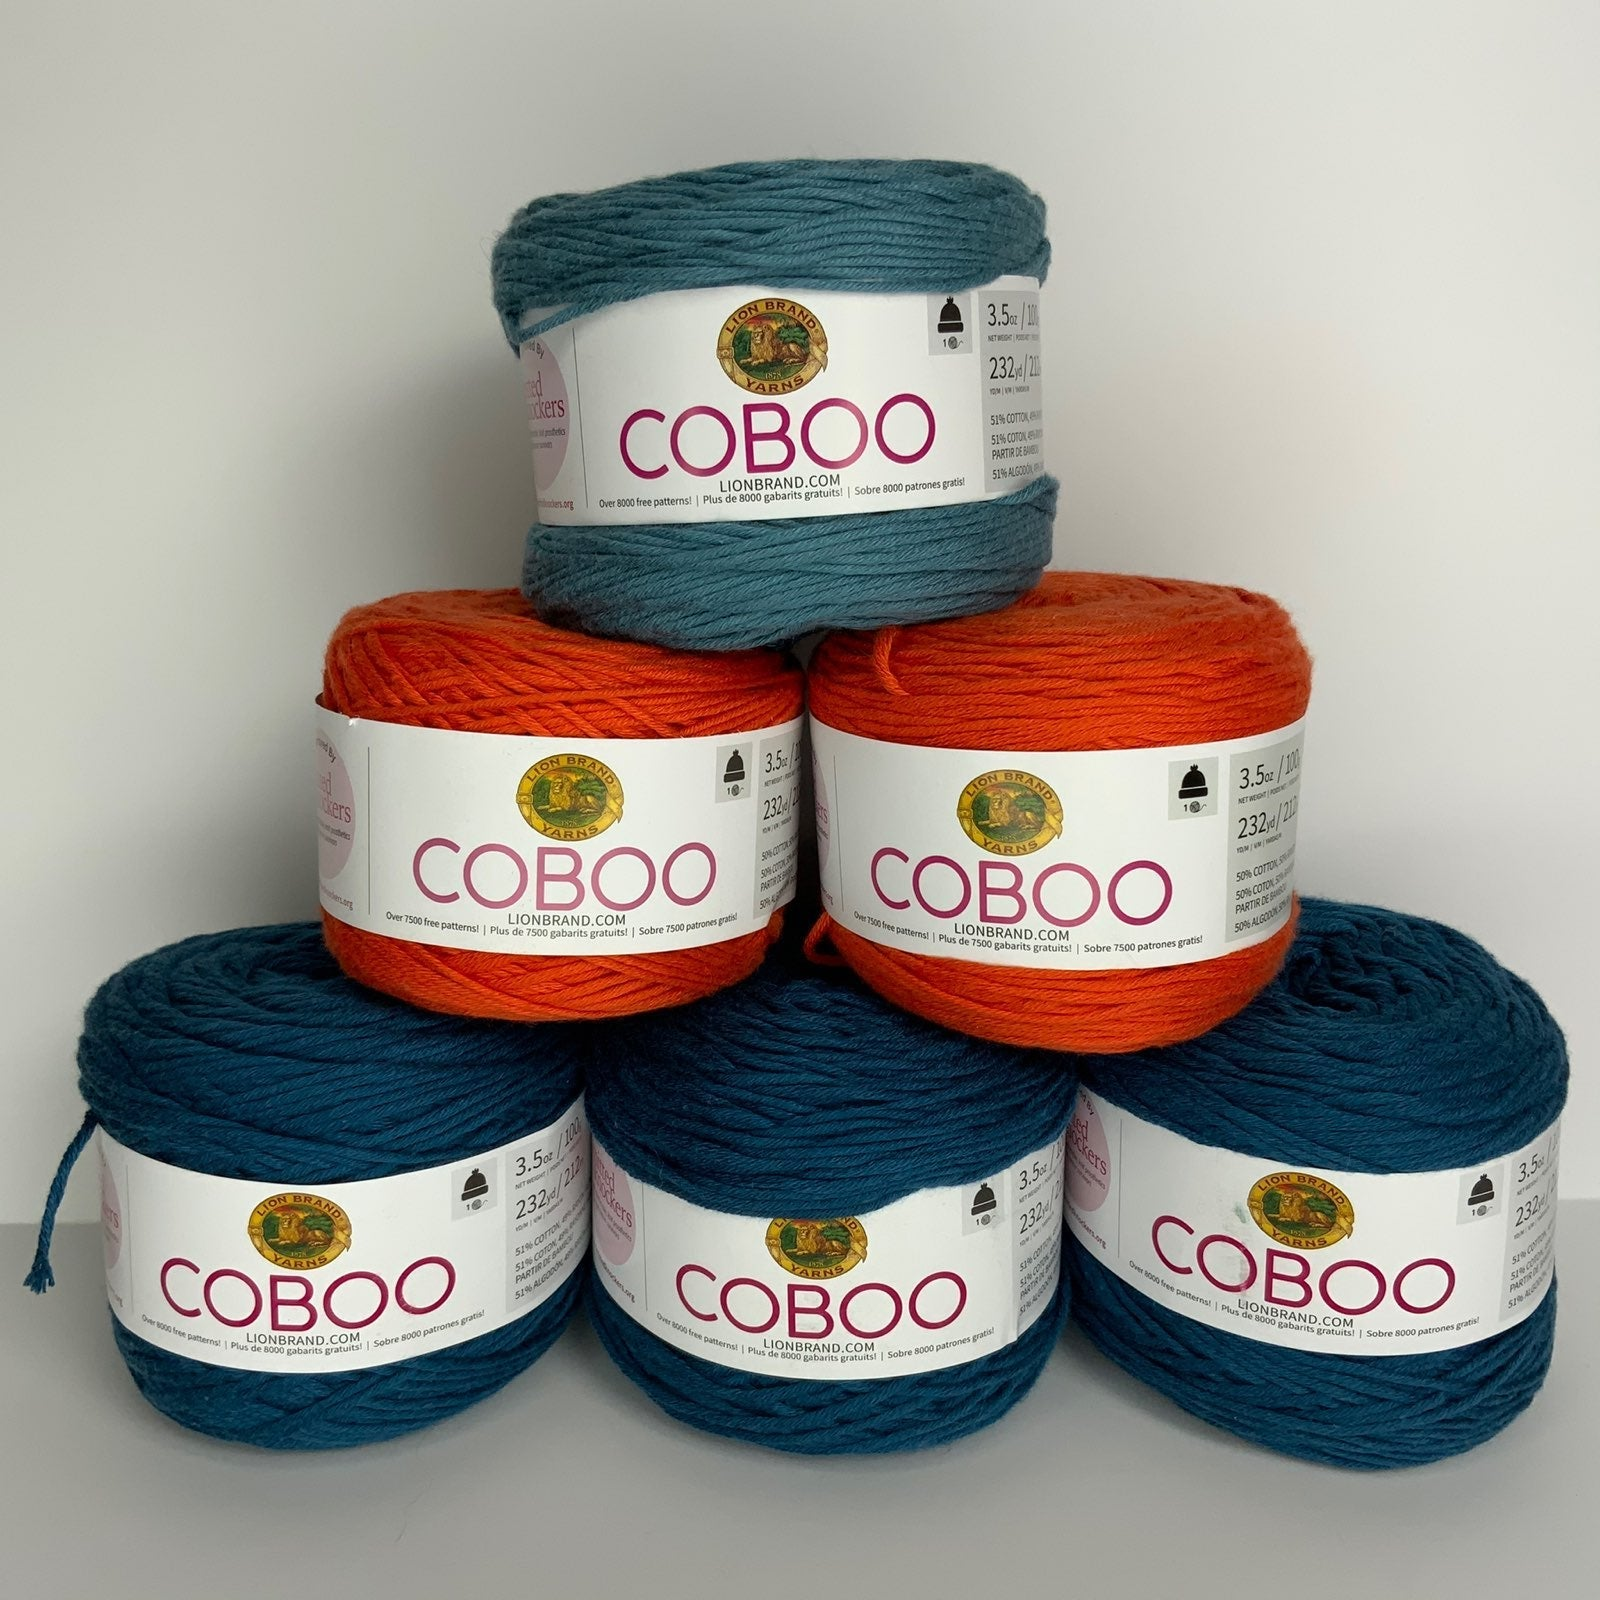 lot of 9 coboo blue/orange